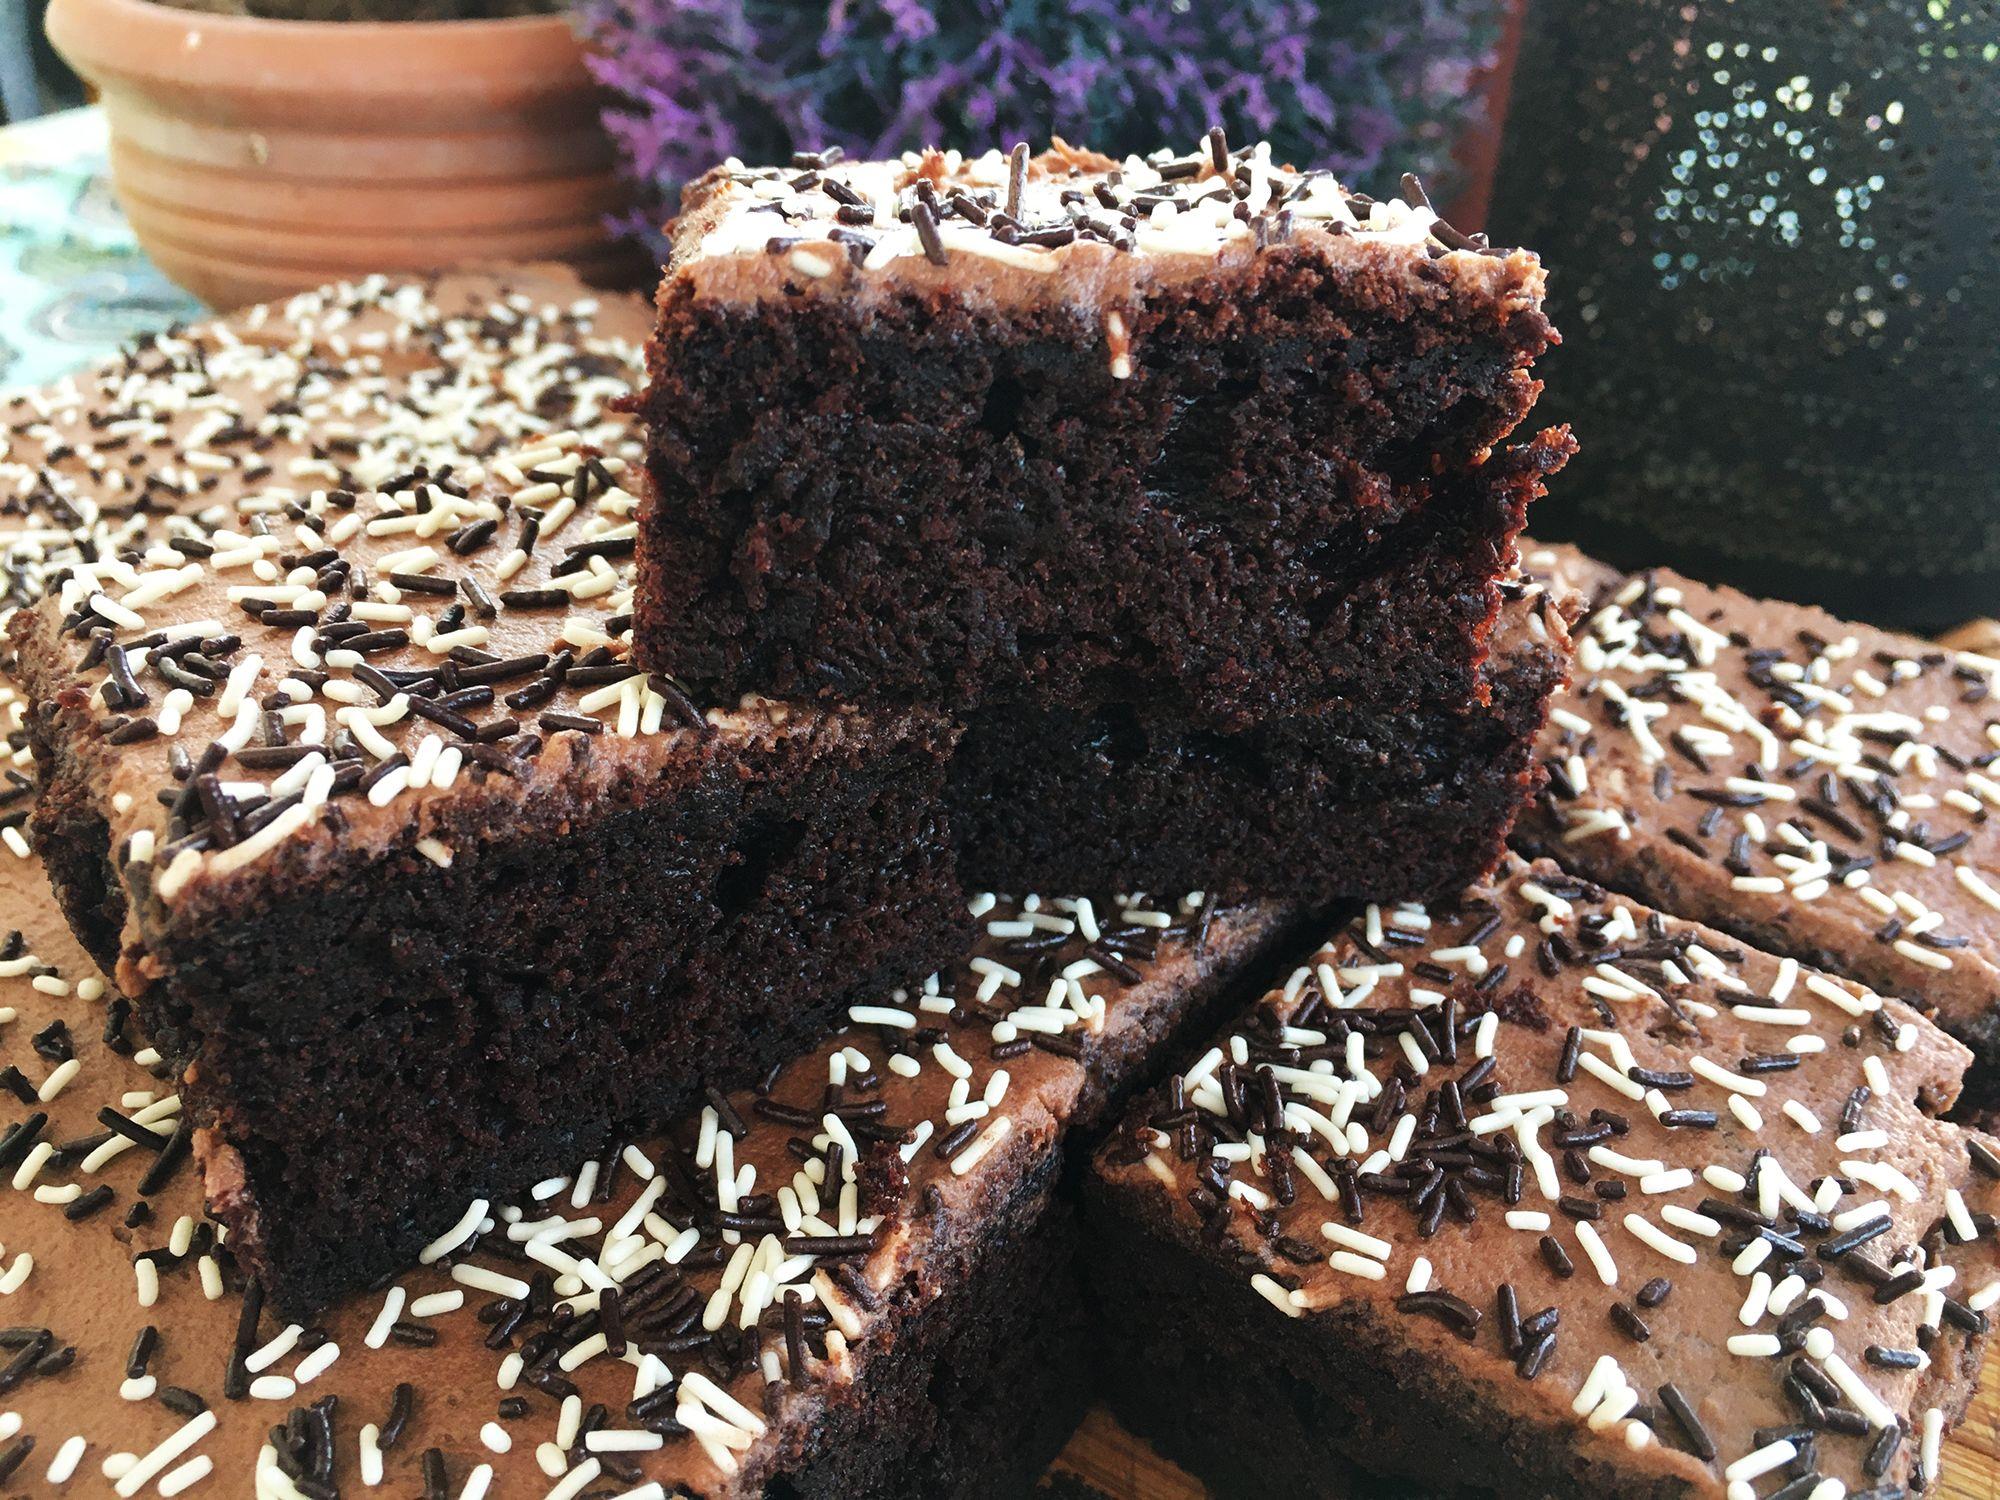 Classic Chocolate Sprinkle Tray Bake Recipe Recipe In 2020 Tray Bakes Chocolate Sprinkles Tray Bake Recipes